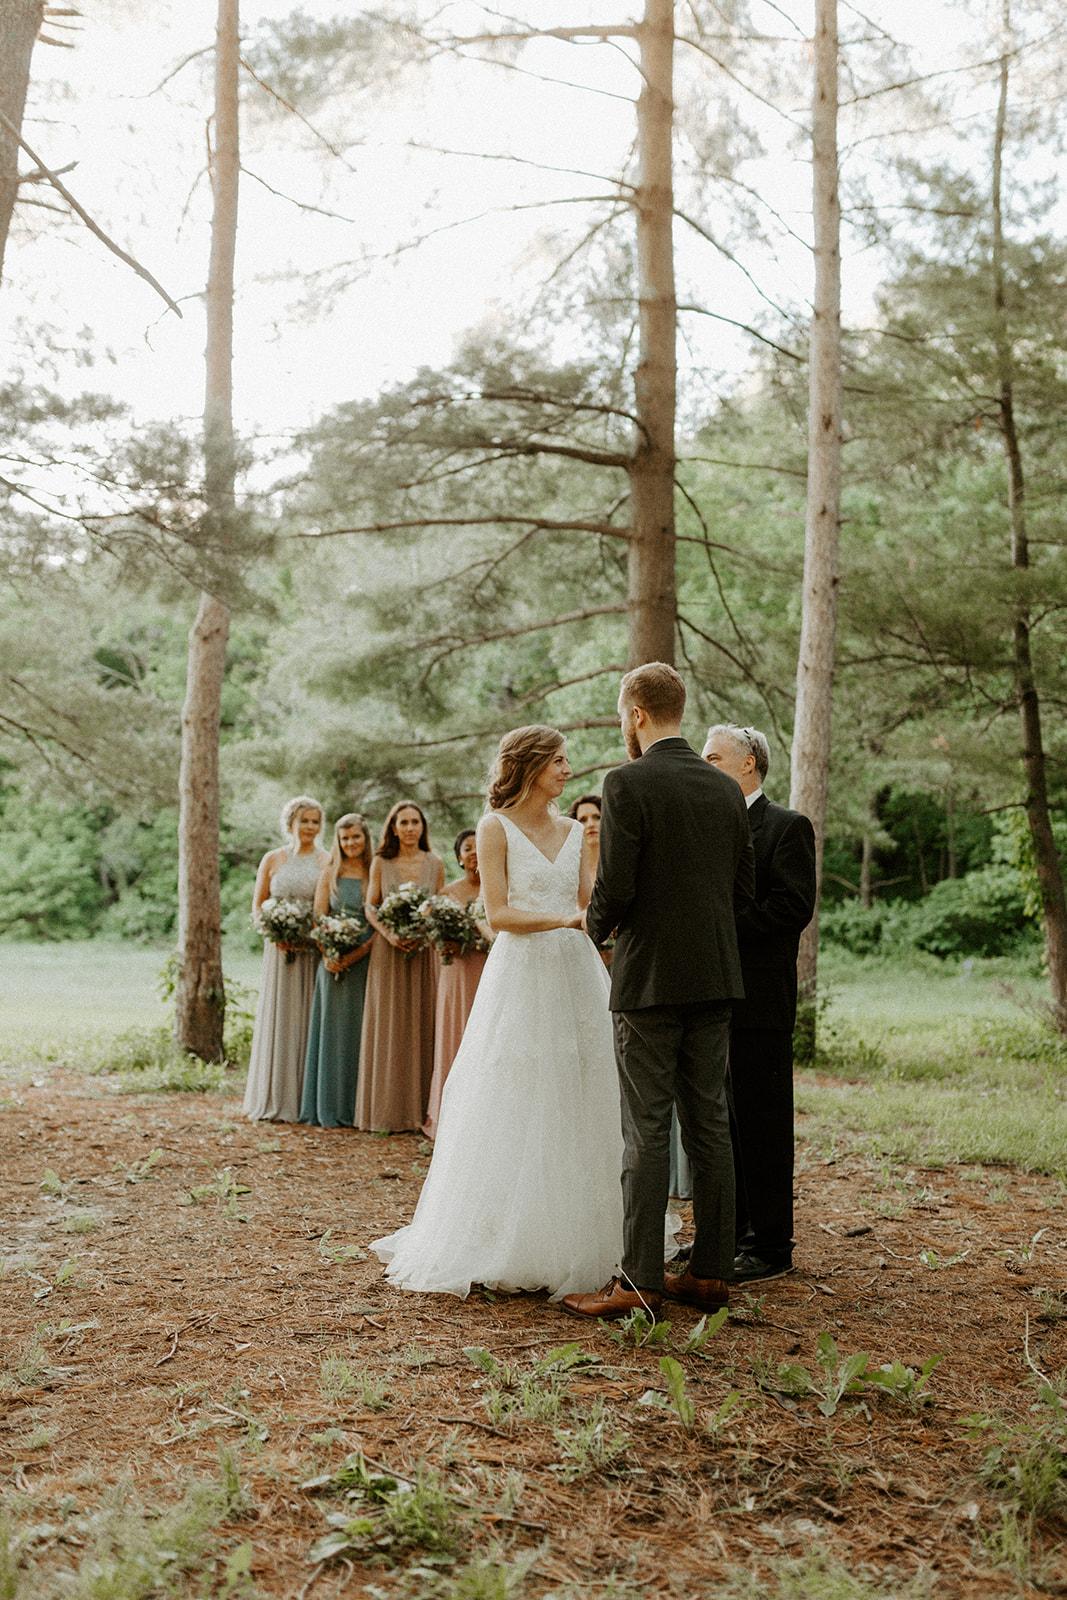 camp_wokanda_peoria_illinois_wedding_photographer_wright_photographs_bliese_0225.jpg